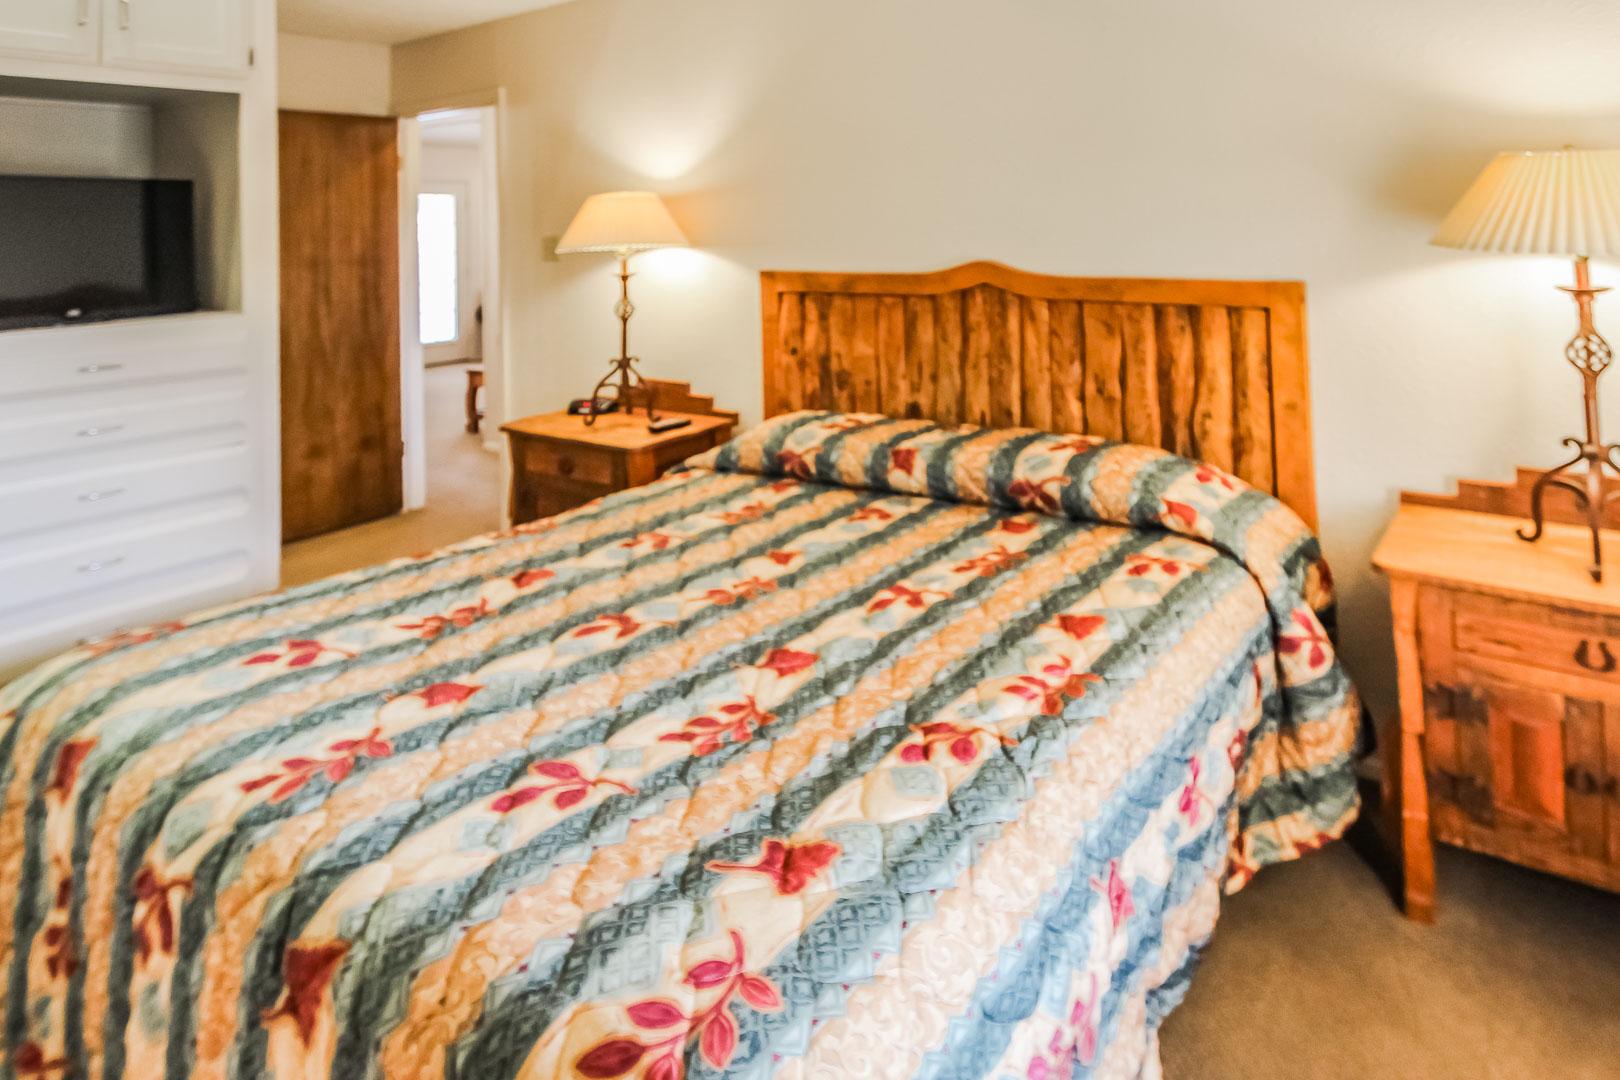 Shores at Lake Travis - Unit Amenities - Bedroom